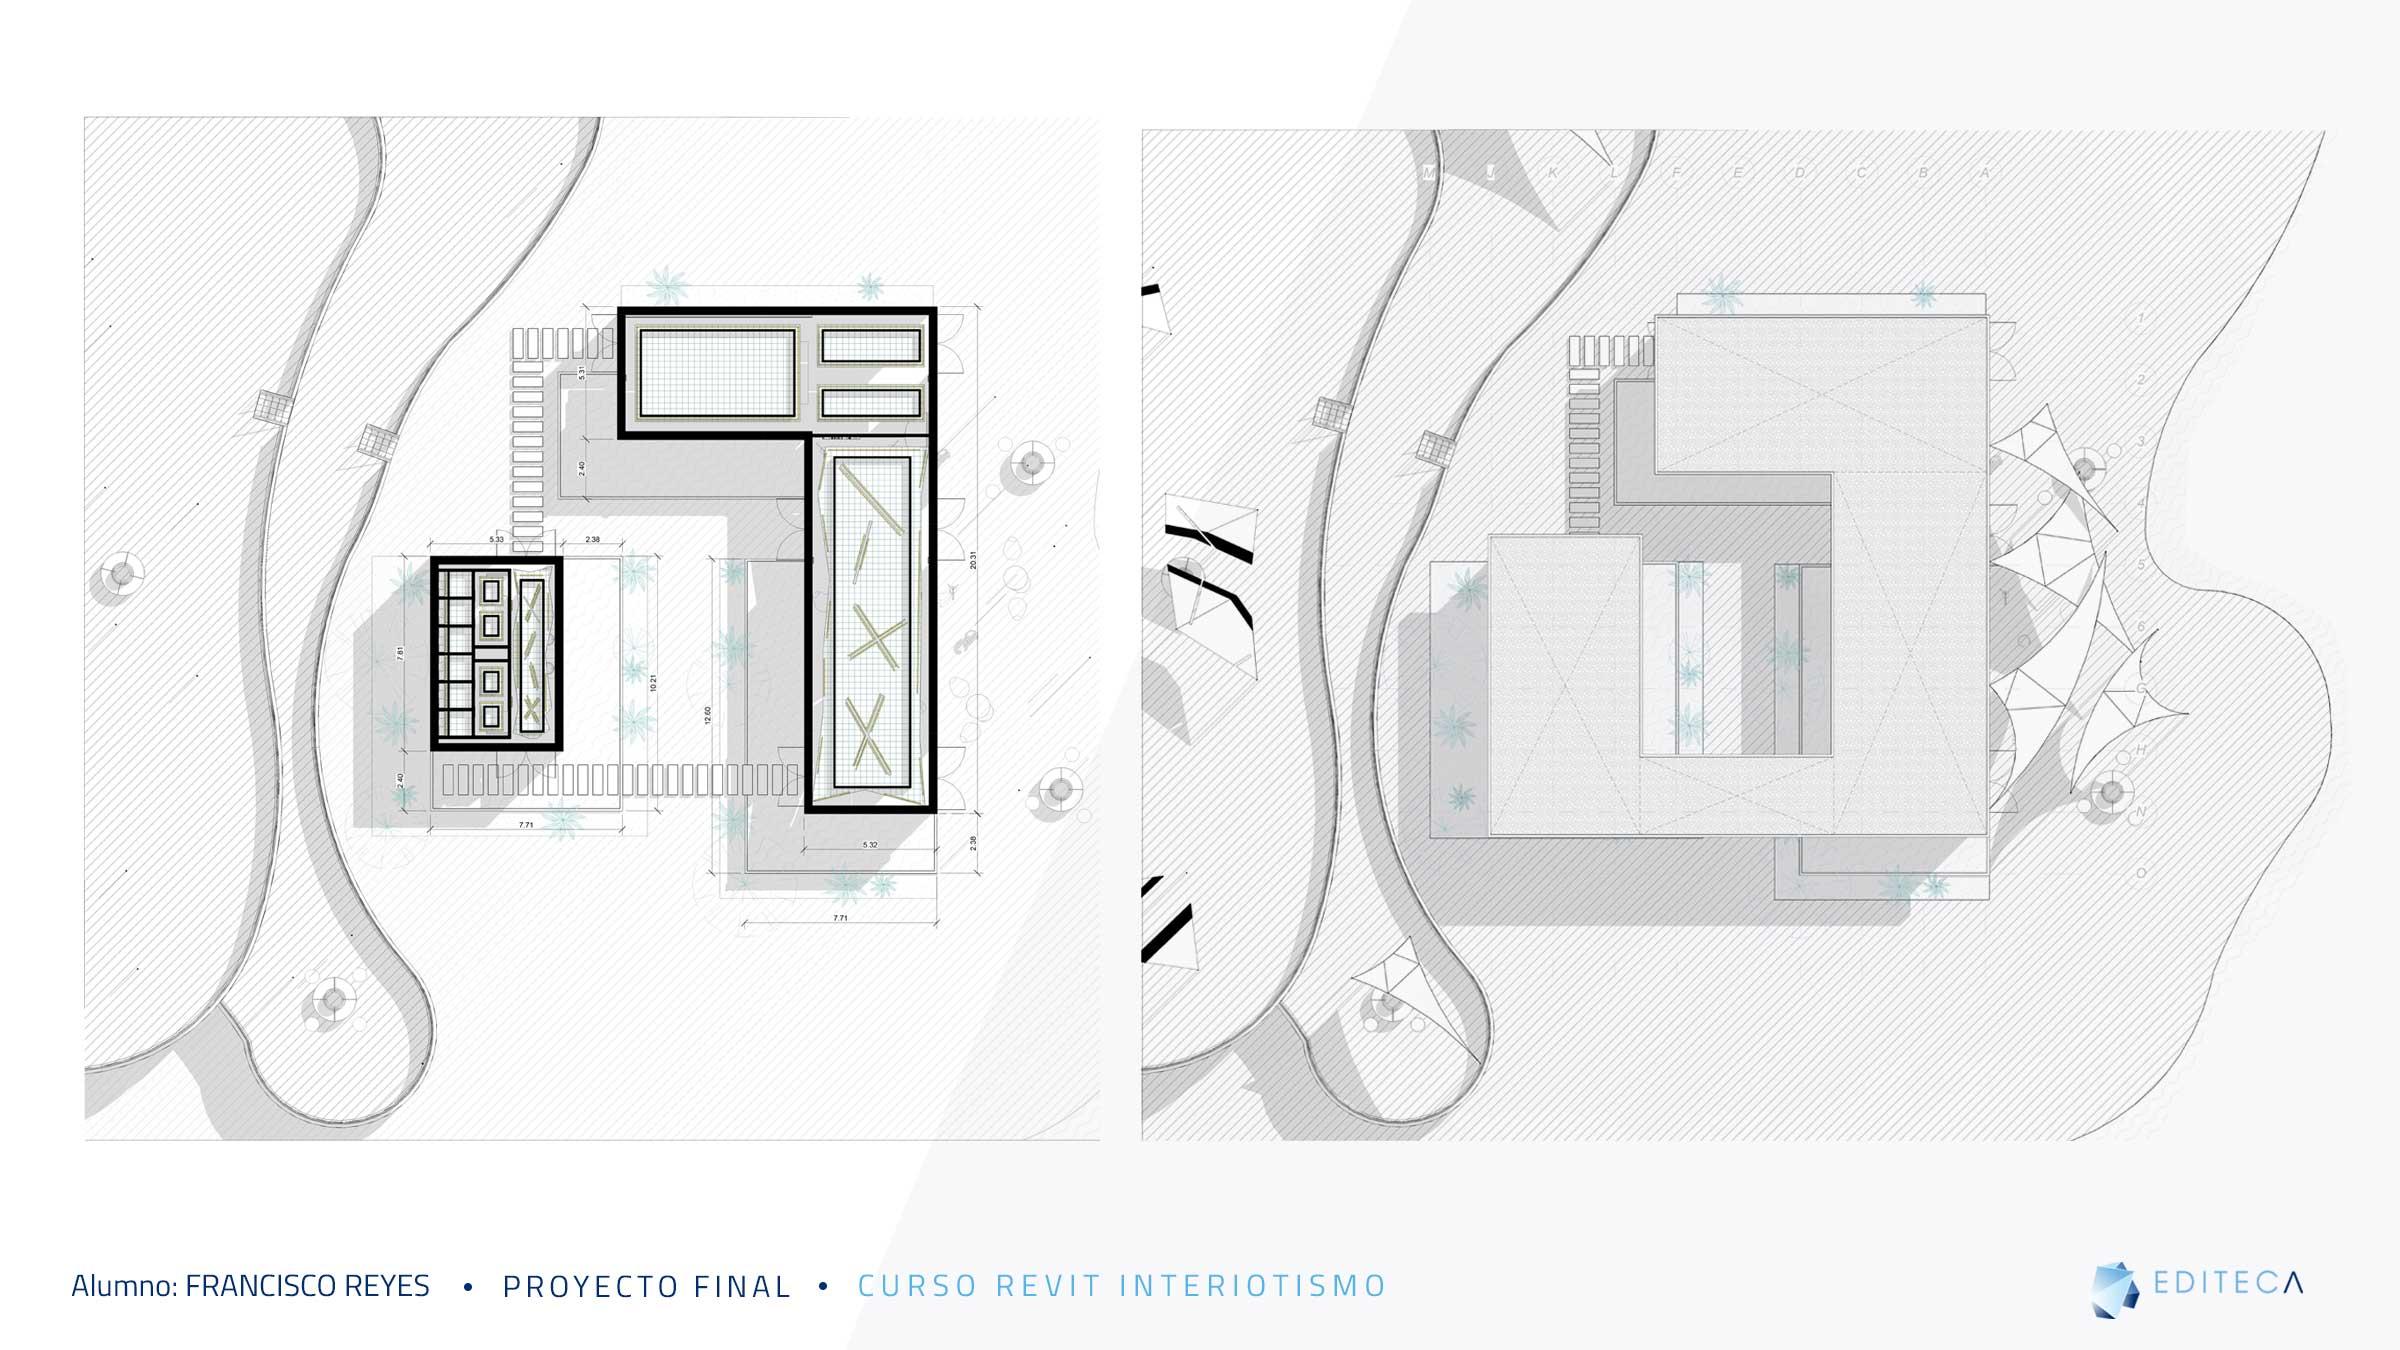 Luminarias-Proyecto proyecto revit interiorismo Francisco Reyes